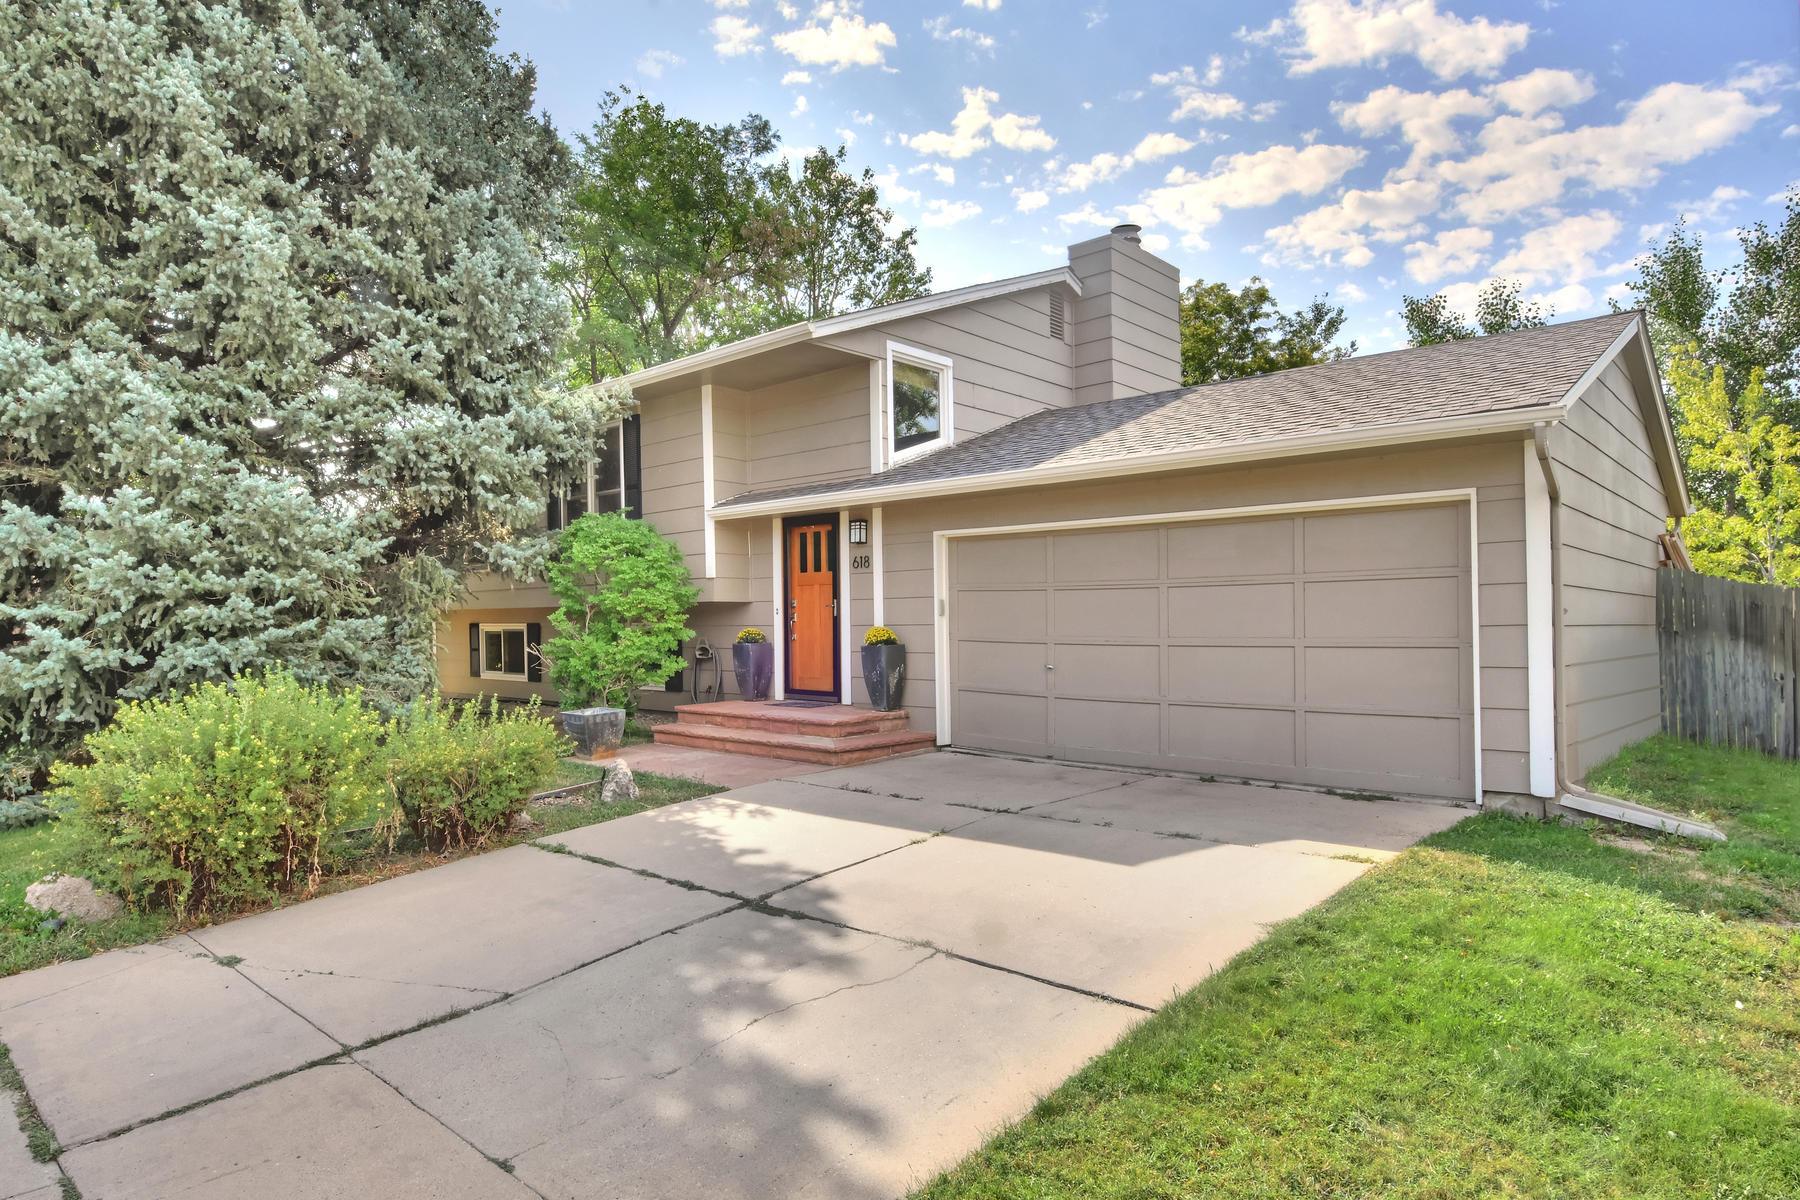 Single Family Homes για την Πώληση στο A Home That Fits Your Lifestyle 618 Glenwood Dr, Lafayette, Κολοραντο 80026 Ηνωμένες Πολιτείες